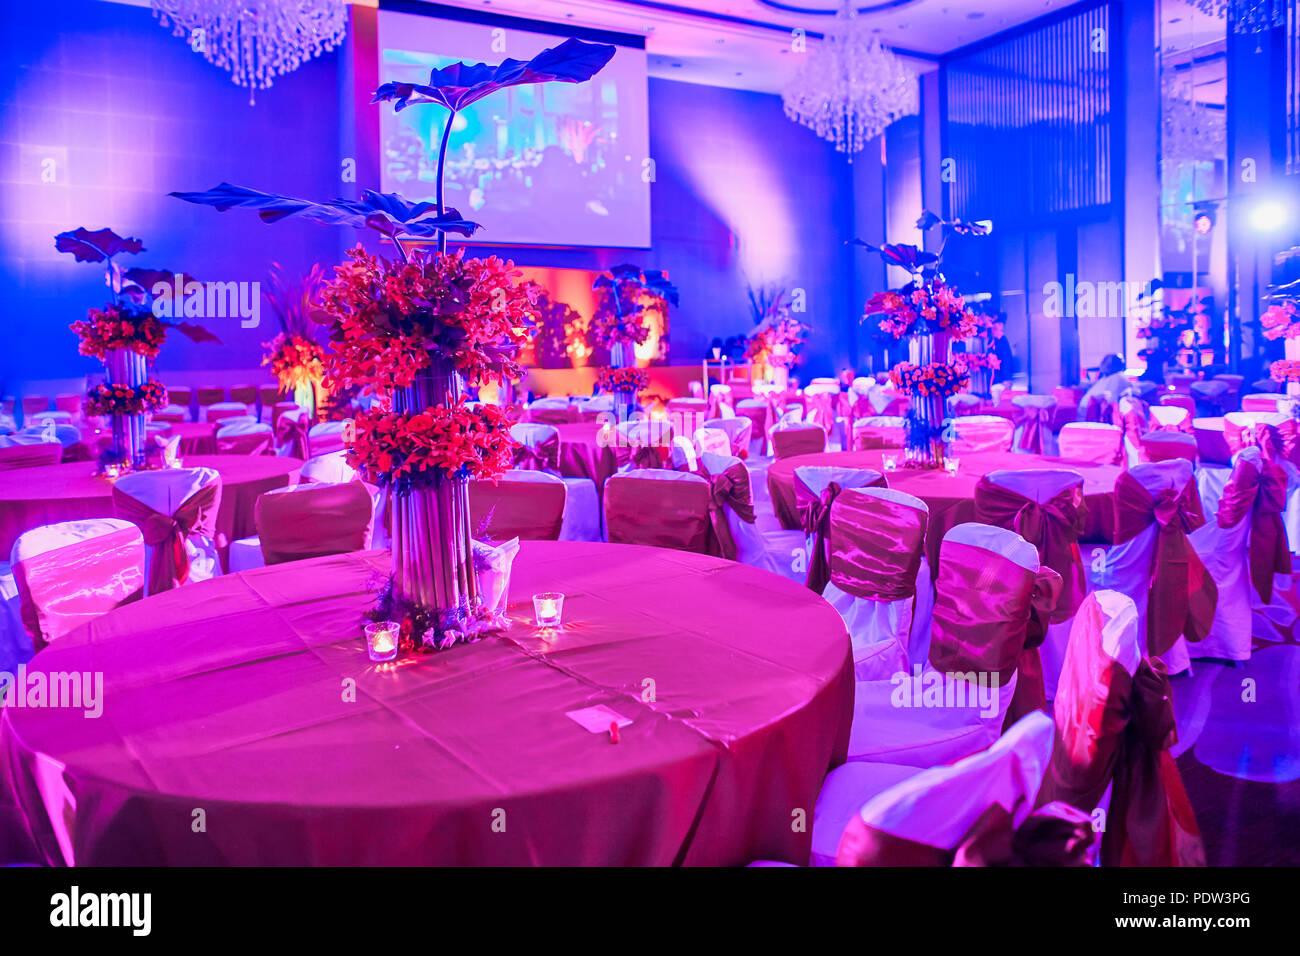 Blue Wedding Theme Stock Photos & Blue Wedding Theme Stock Images ...